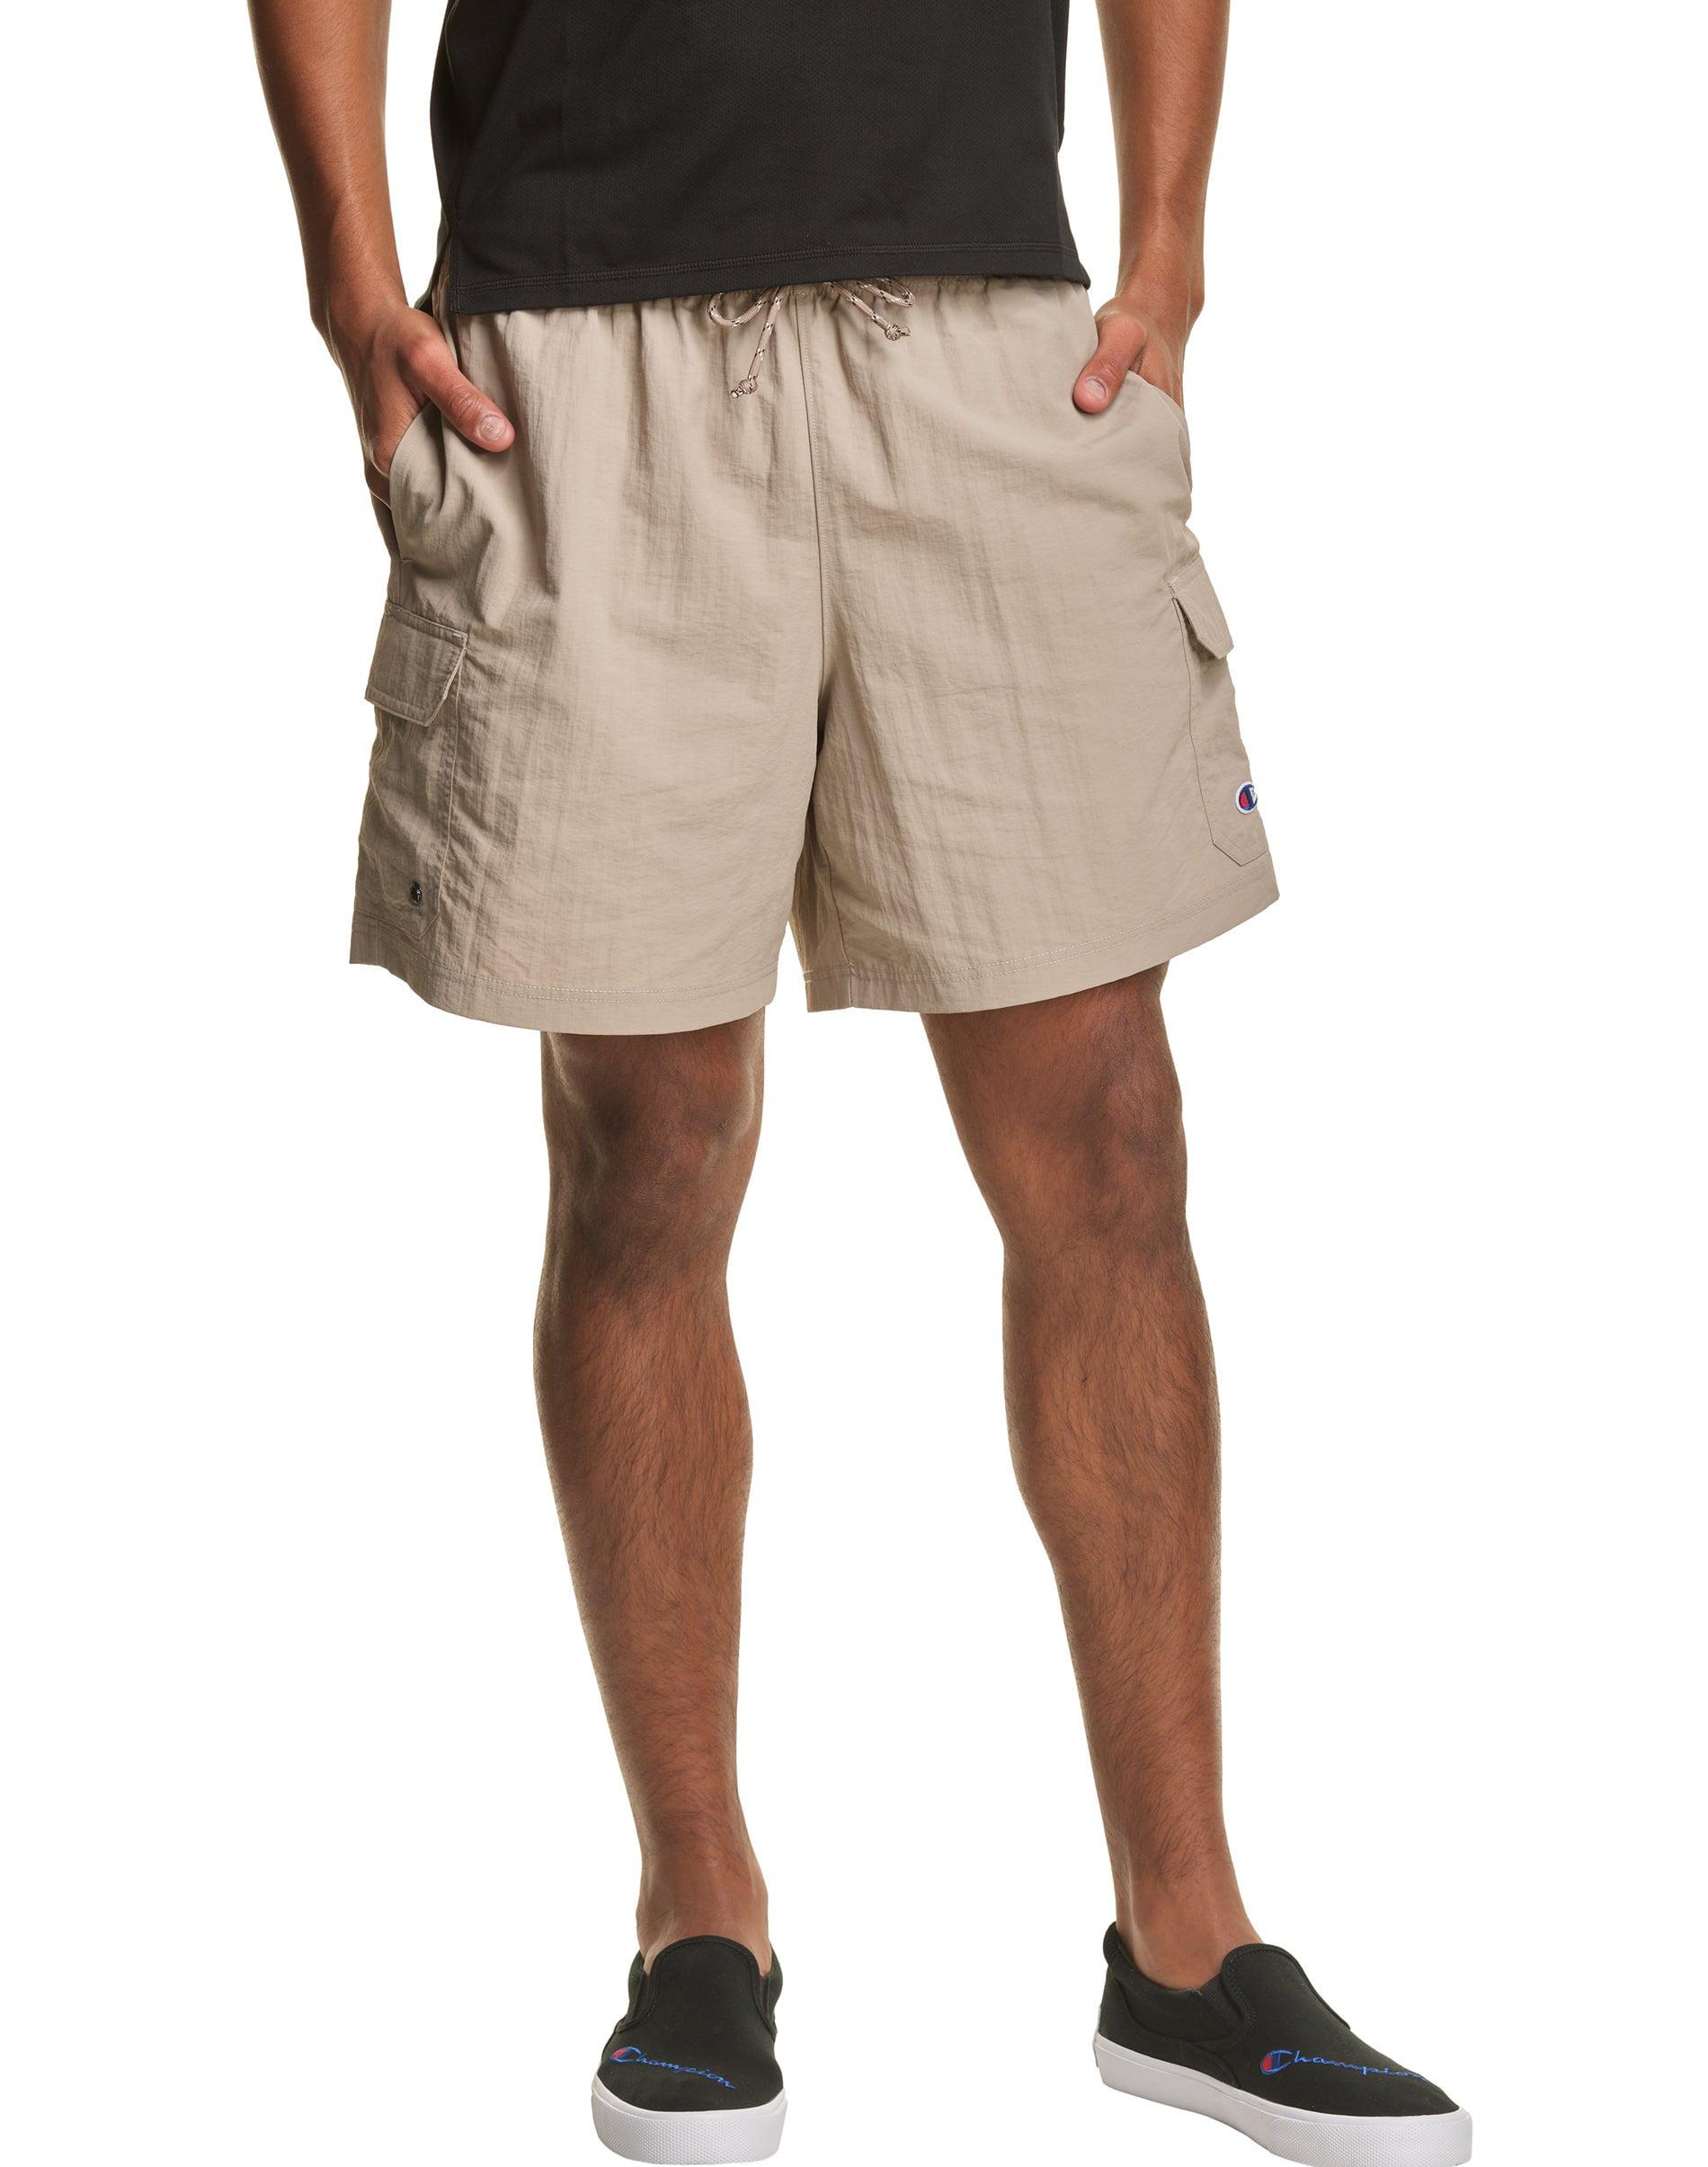 LEVI/'S Men/'s Snap Cargo Shorts Khaki Tan Size 42 Long Below Knee